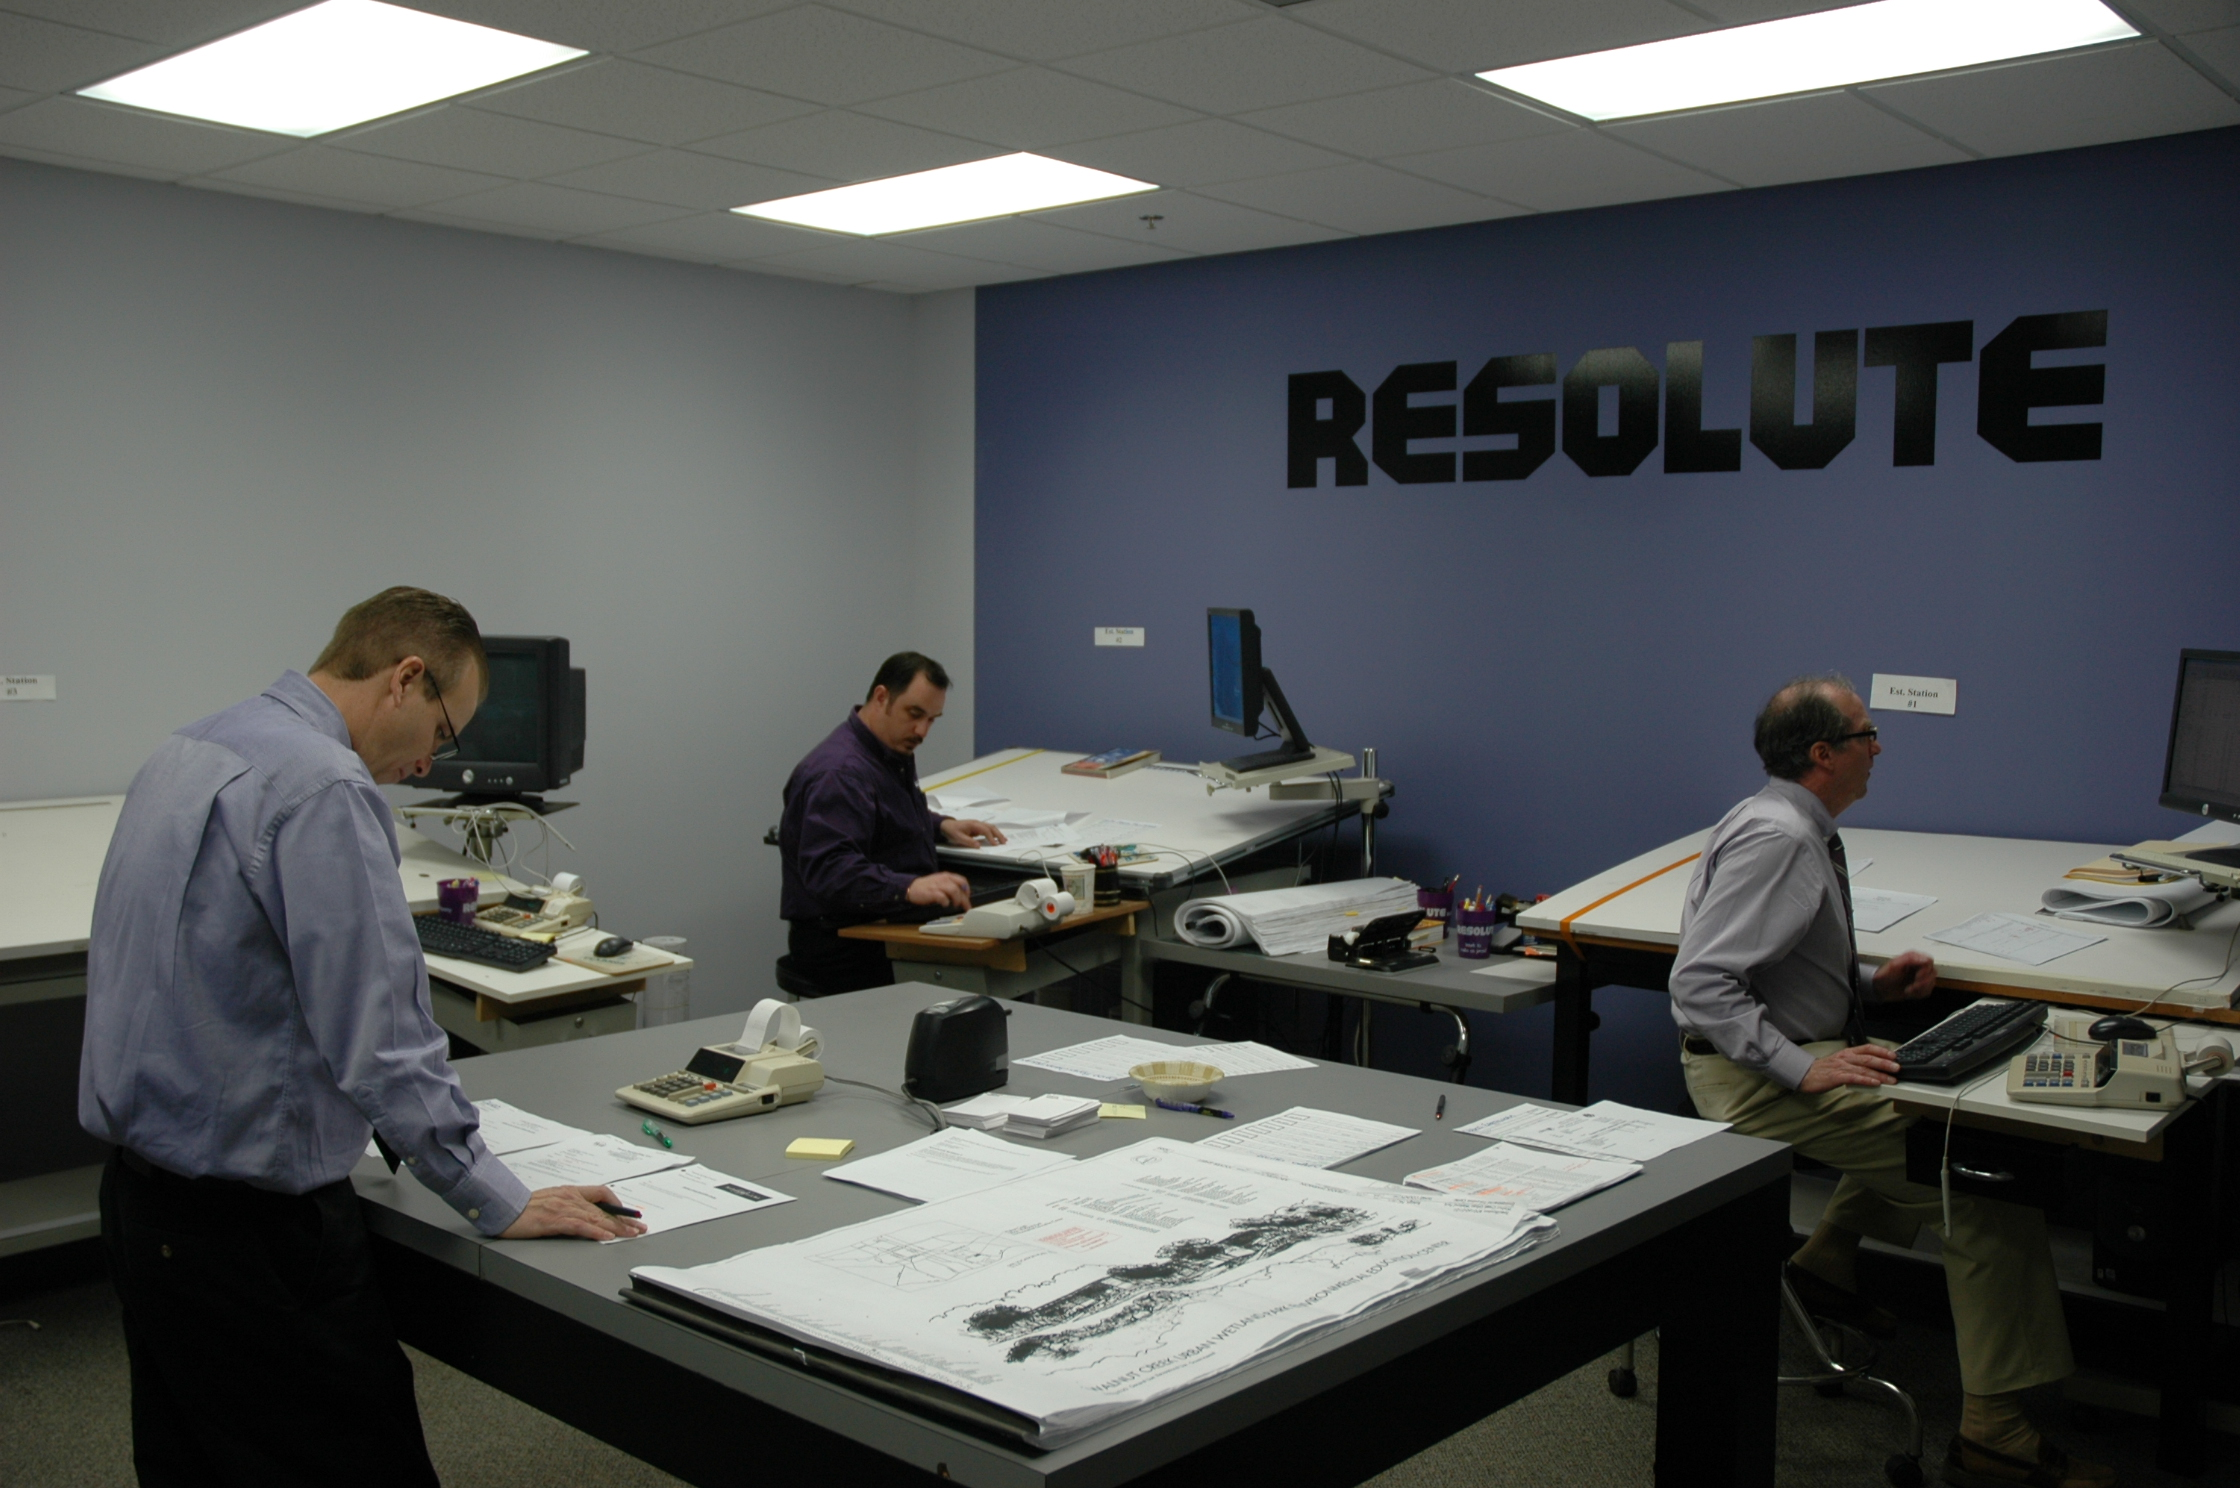 RESOLUTE Office